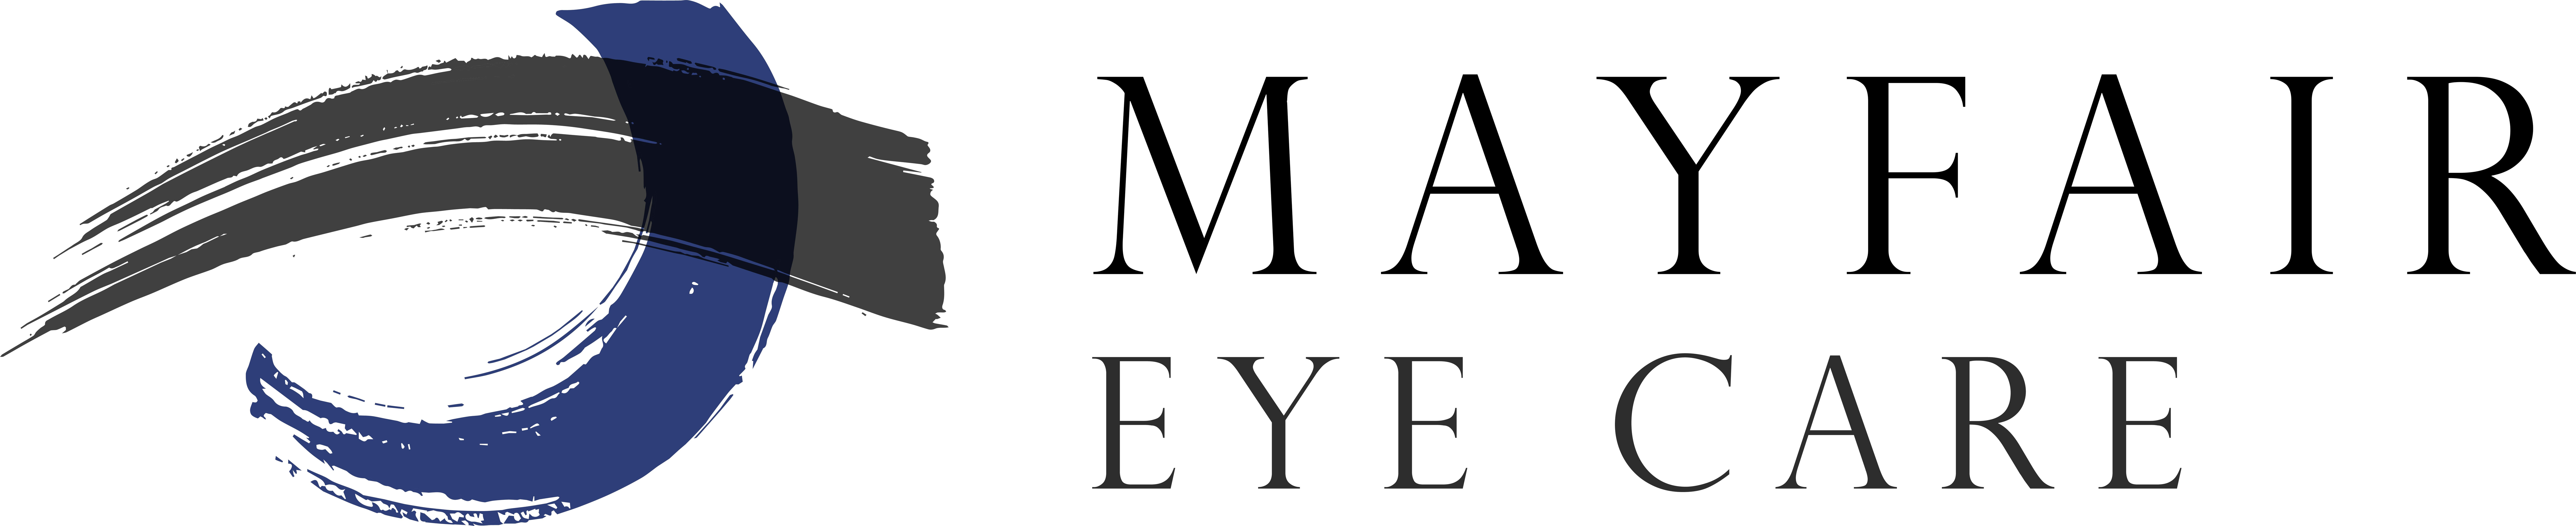 Mayfair Eye Care